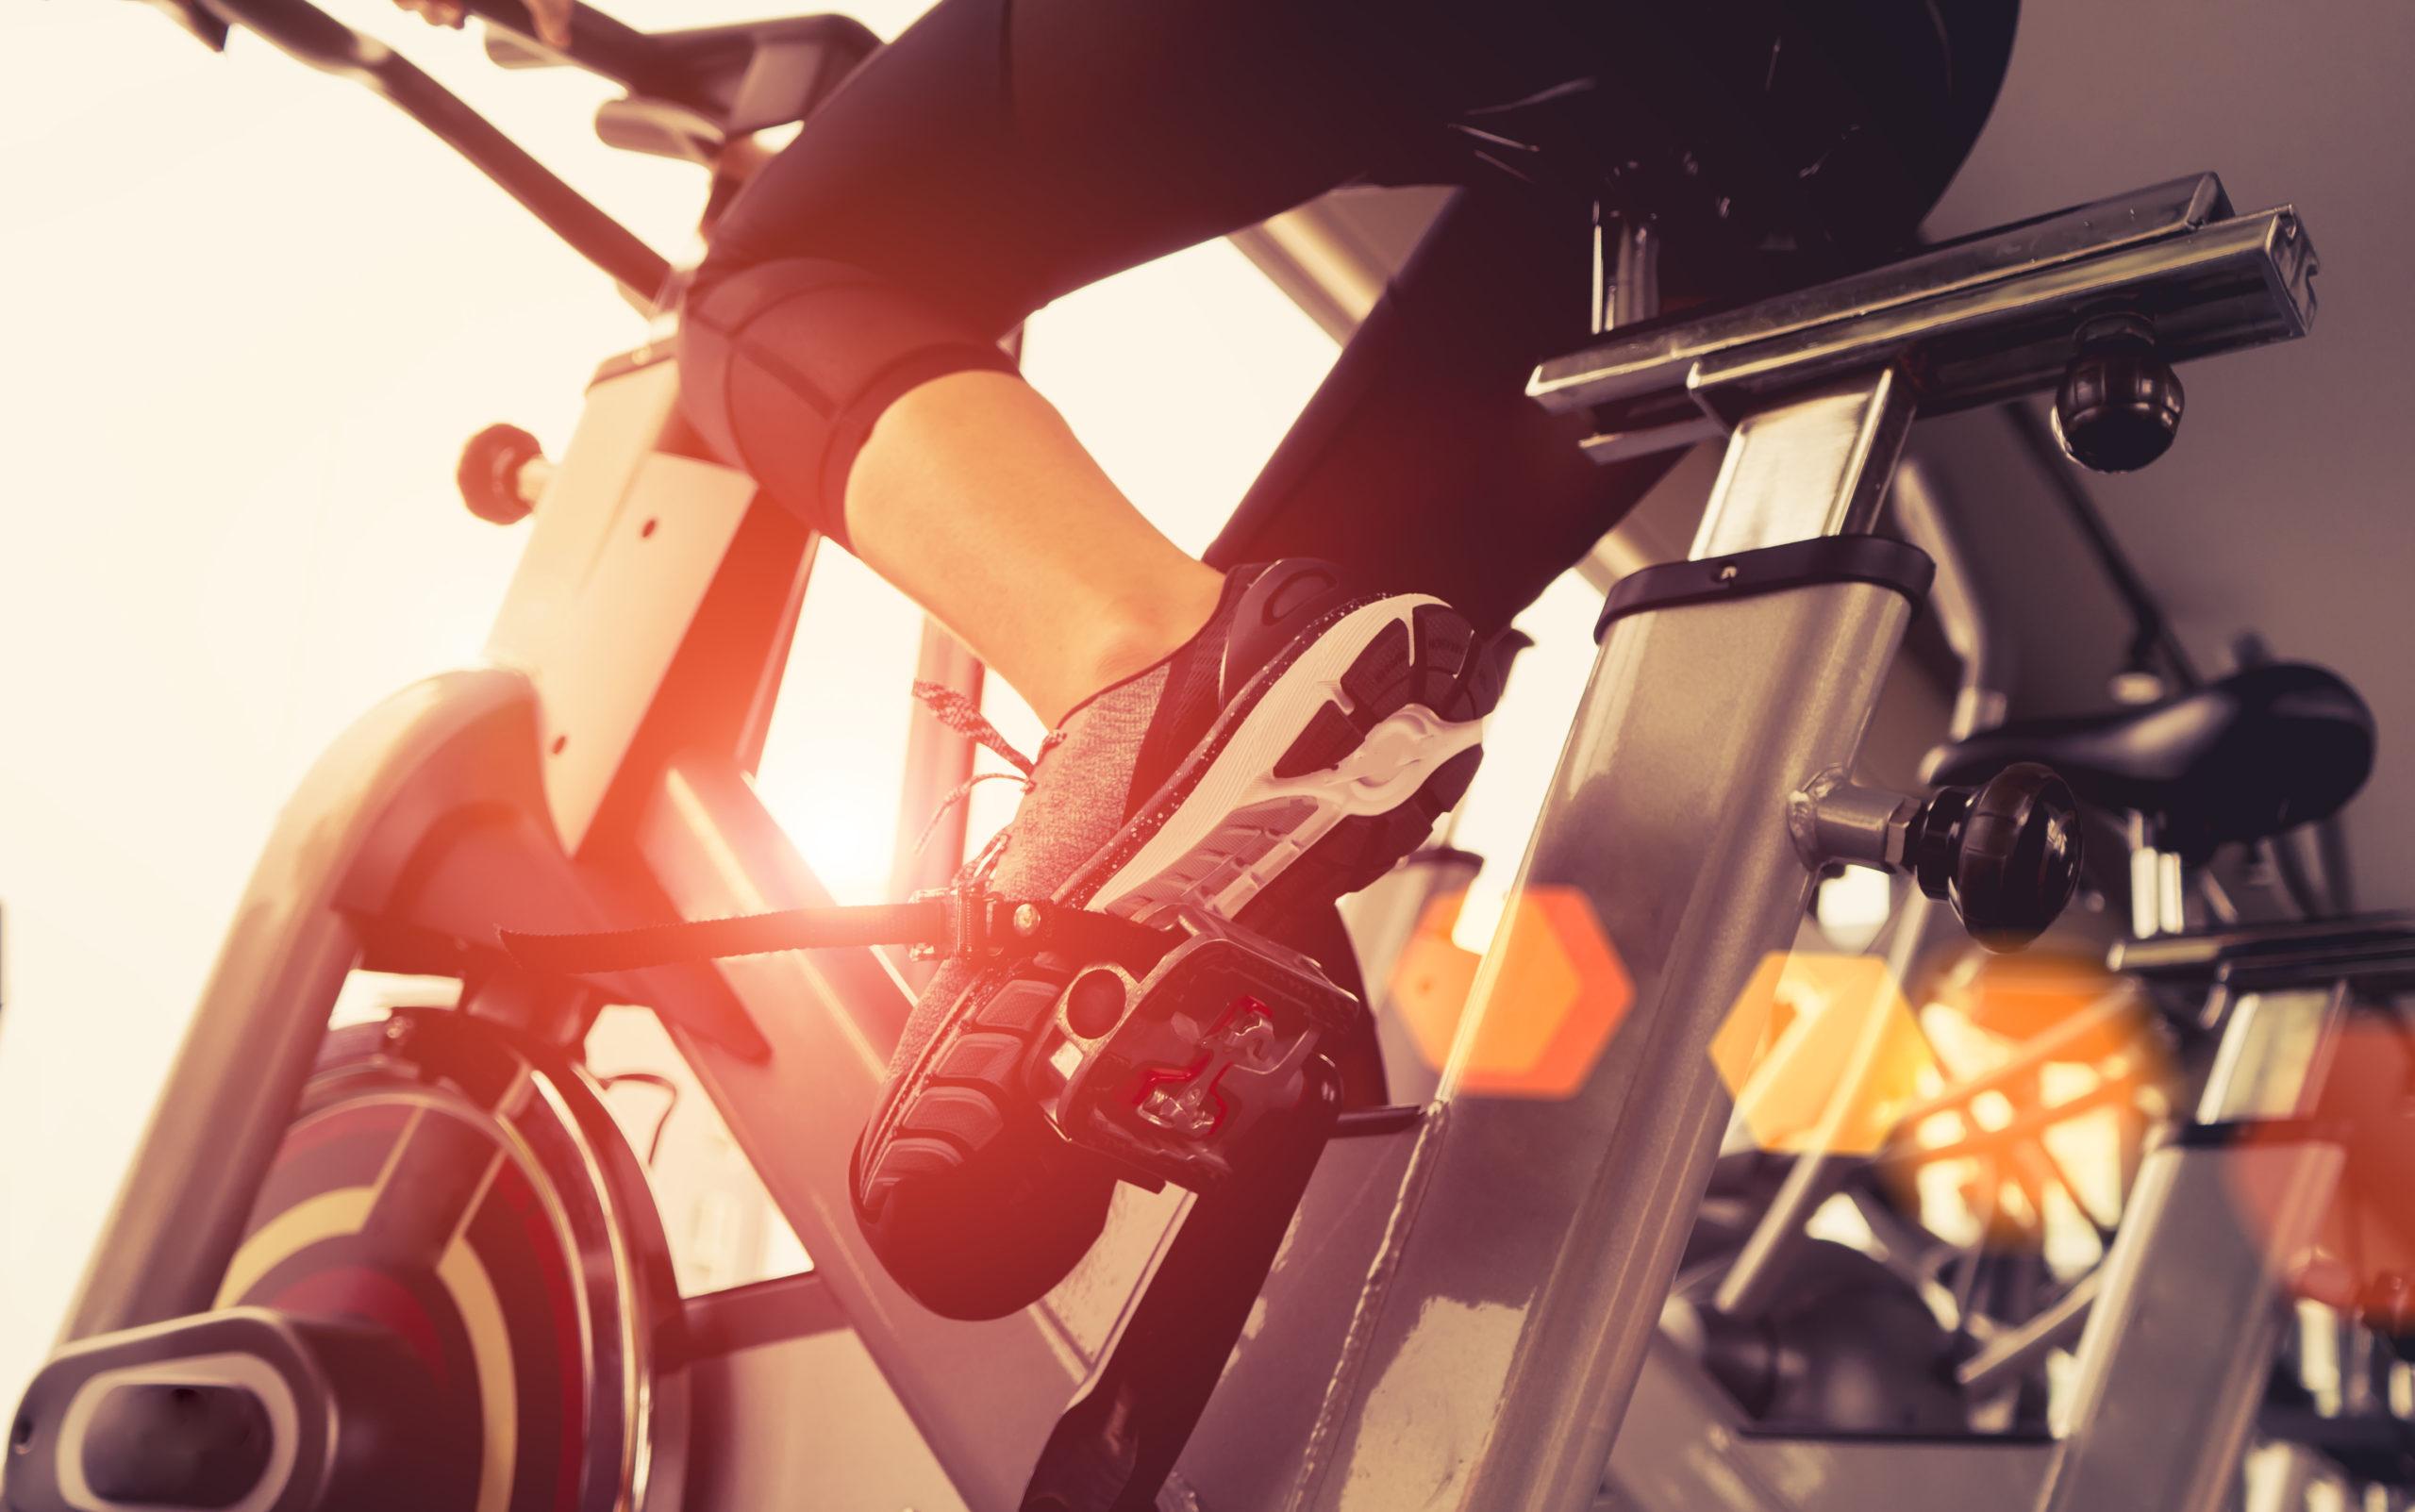 horizon ic7.9 indoor cycle review